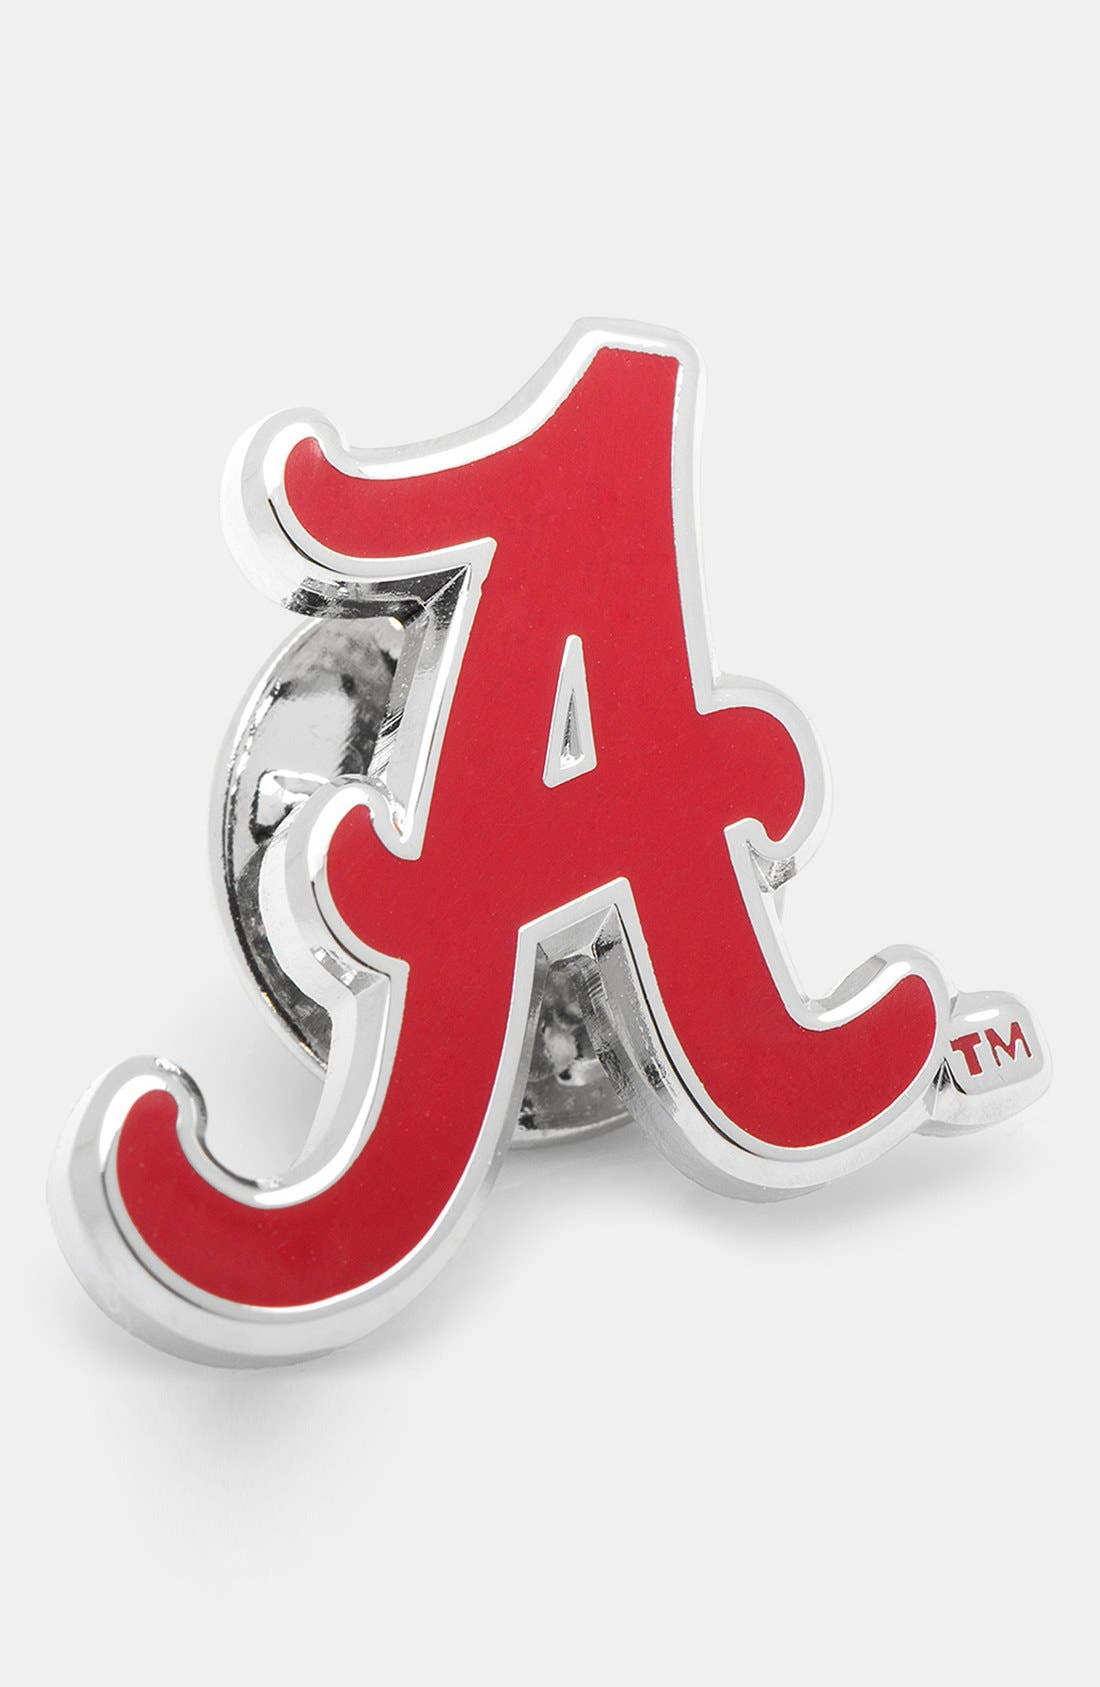 Alternate Image 1 Selected - Cufflinks, Inc. 'Alabama Crimson Tide' Lapel Pin